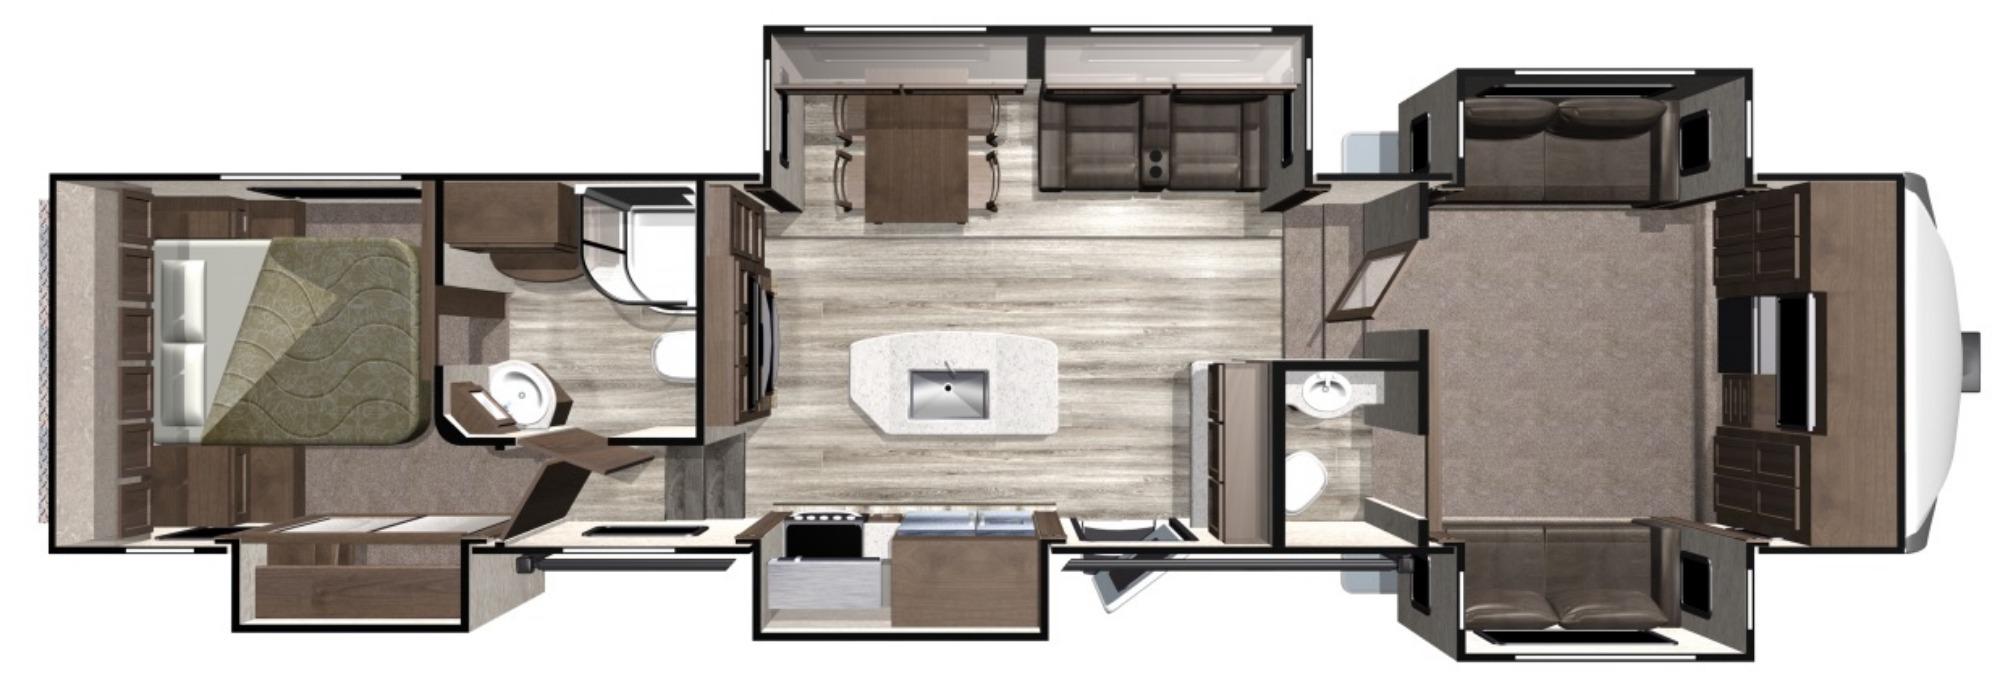 View Floor Plan for 2020 HIGHLAND RIDGE OPEN RANGE 376FBH